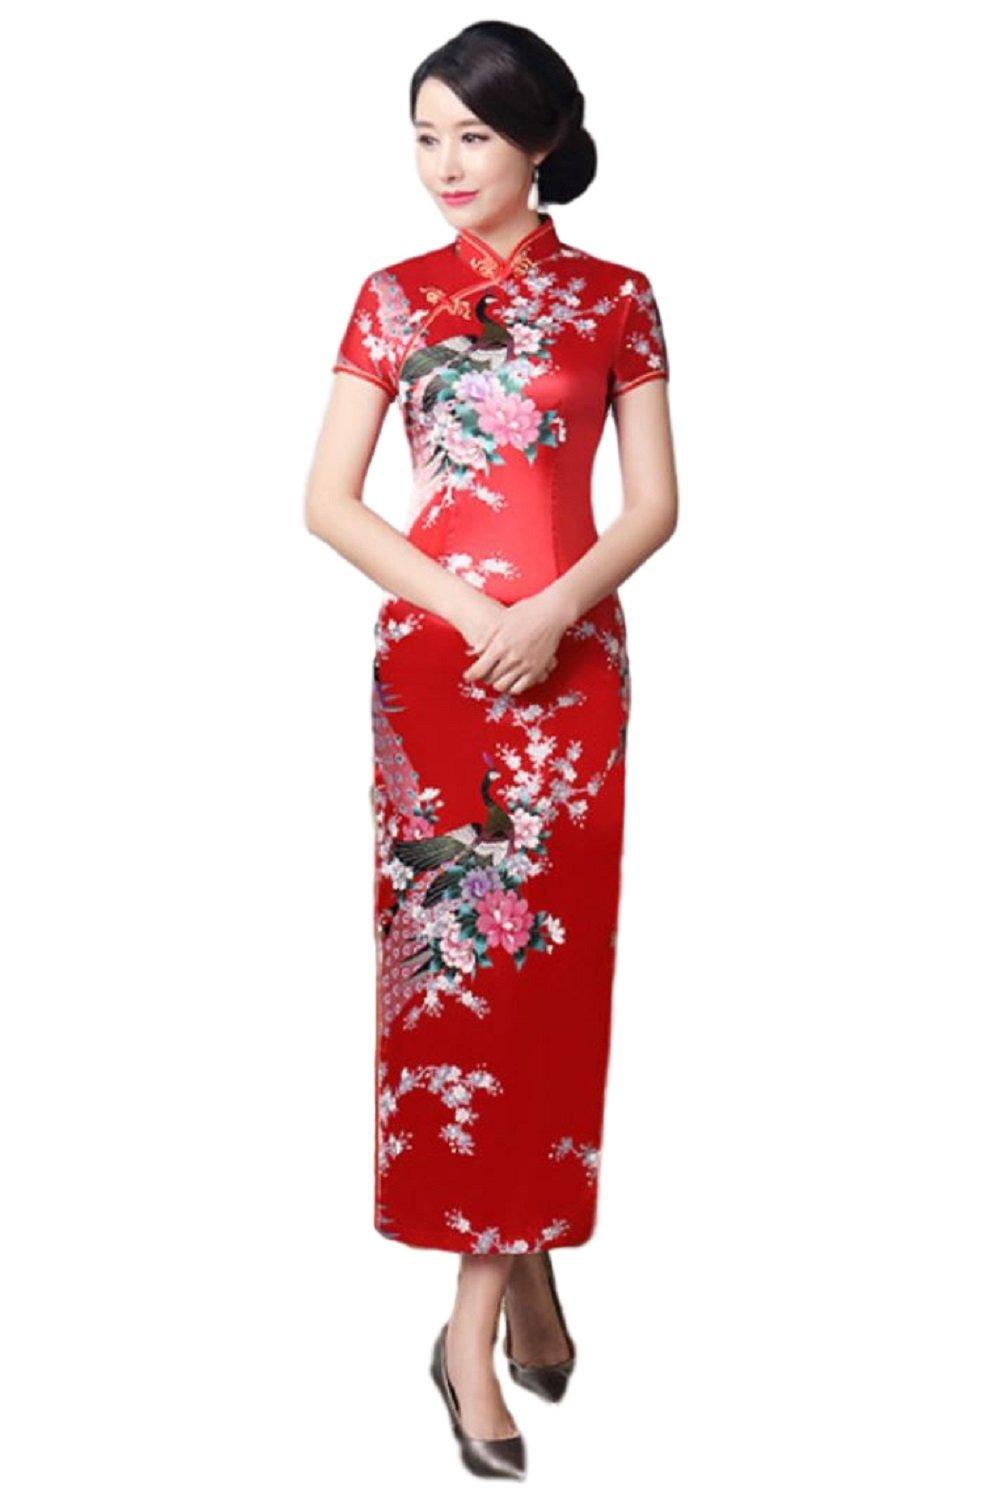 hideaway Women's Long Chinese Dress Cheongsam [White/Purple/Black/Red] Mandarin Gown Qipao China Dress